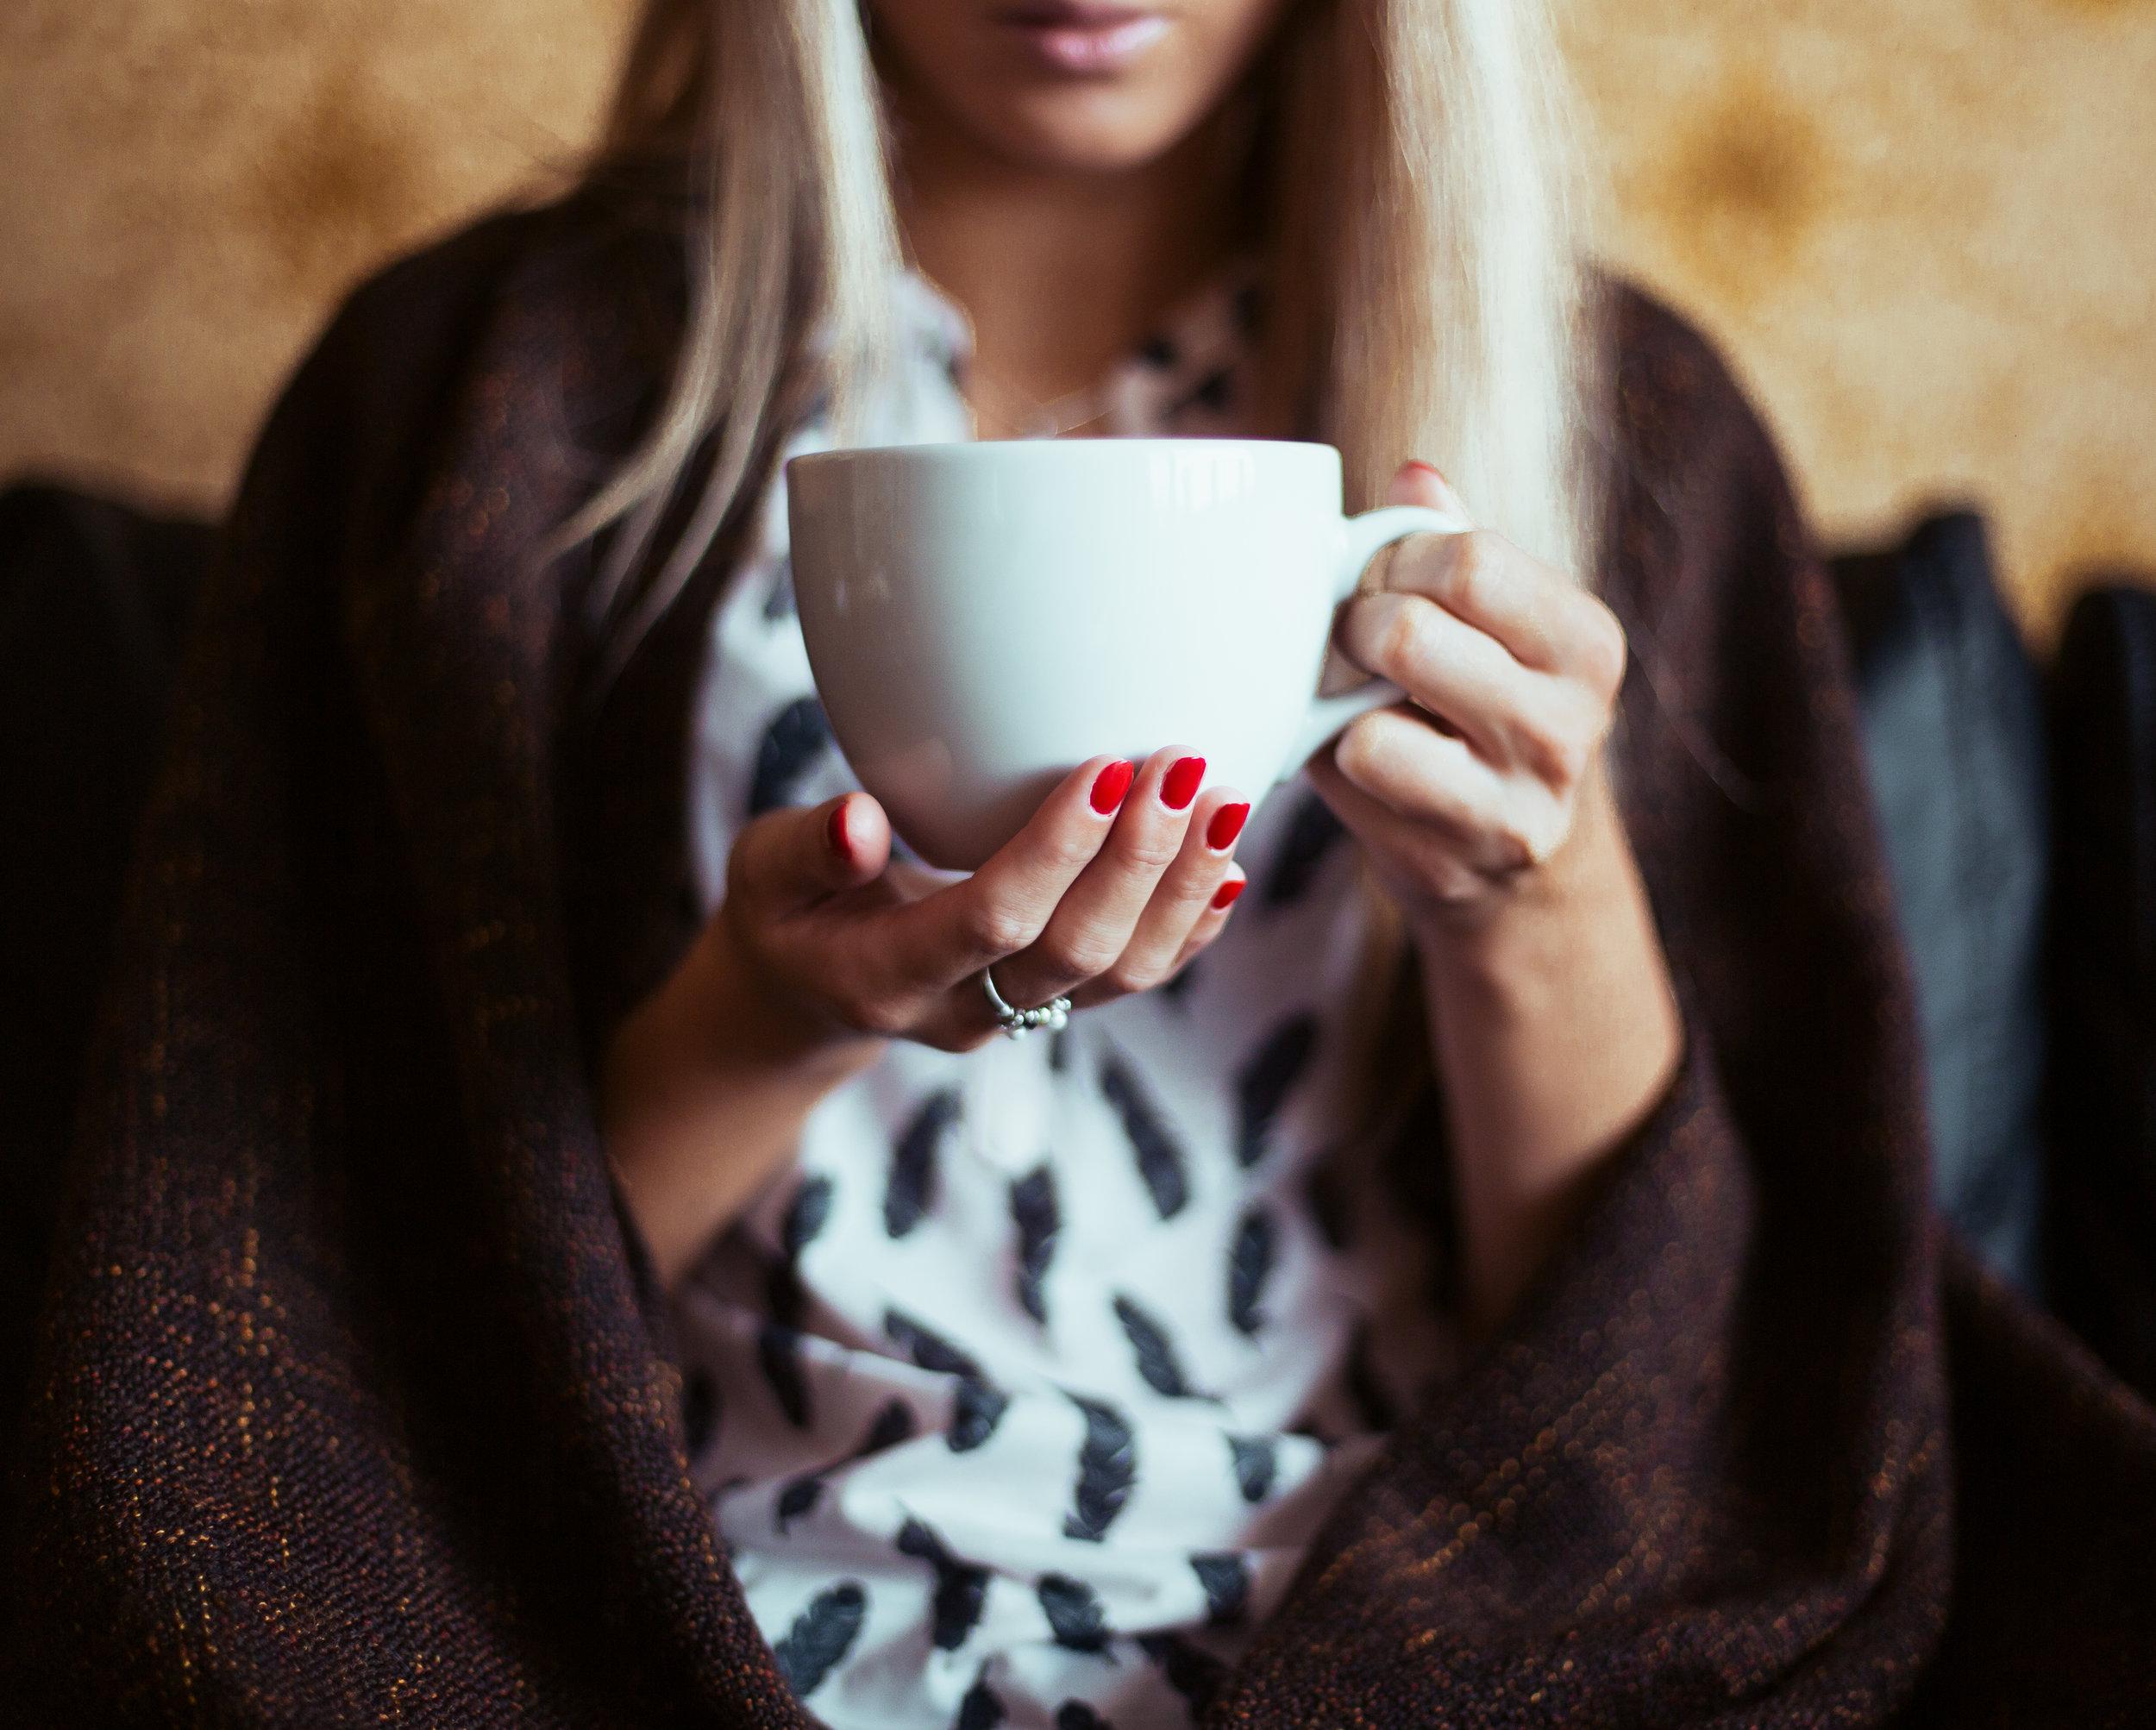 young-woman-drinking-a-tea-picjumbo-com.jpg